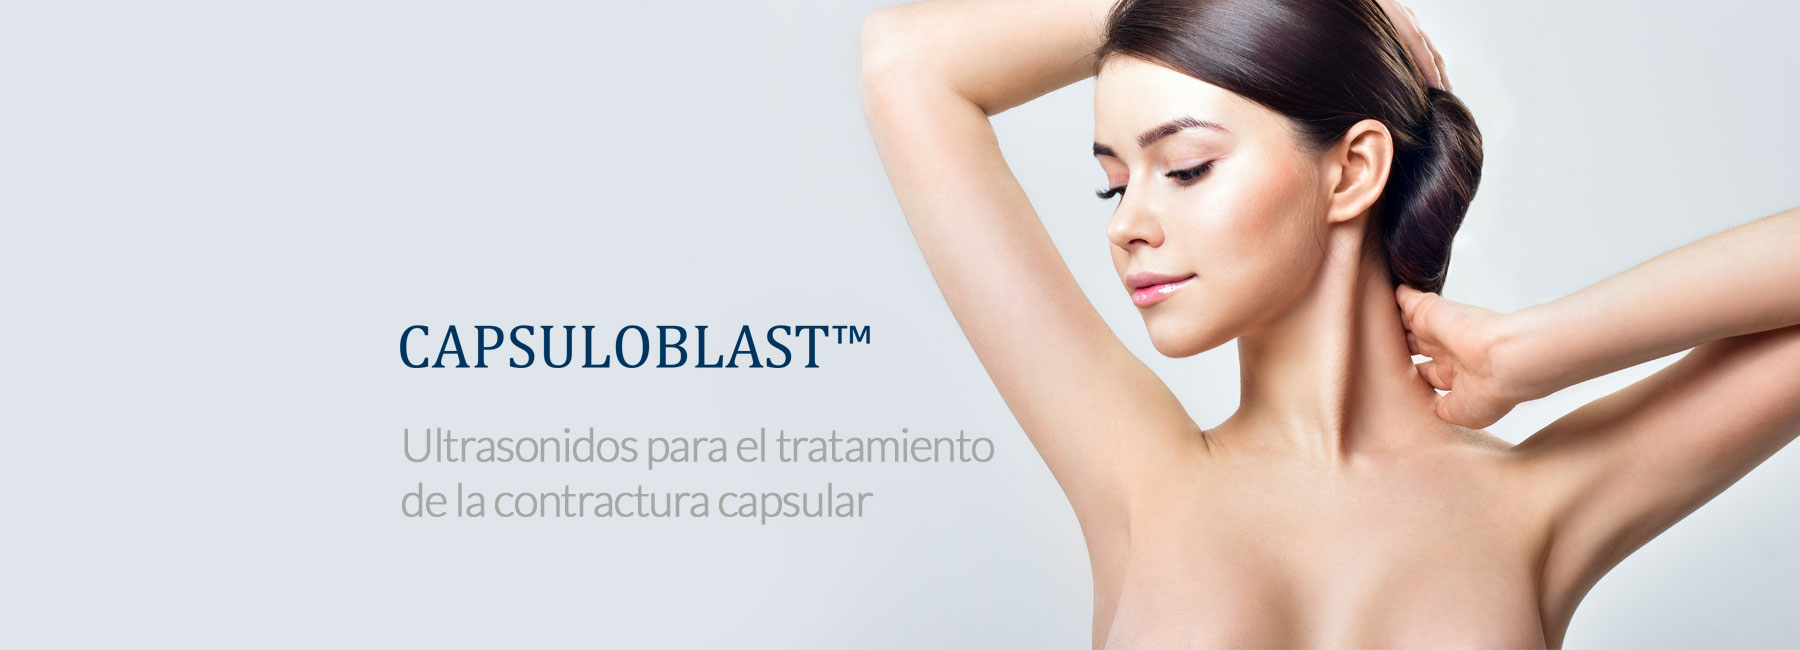 capsuloblast-slide-3